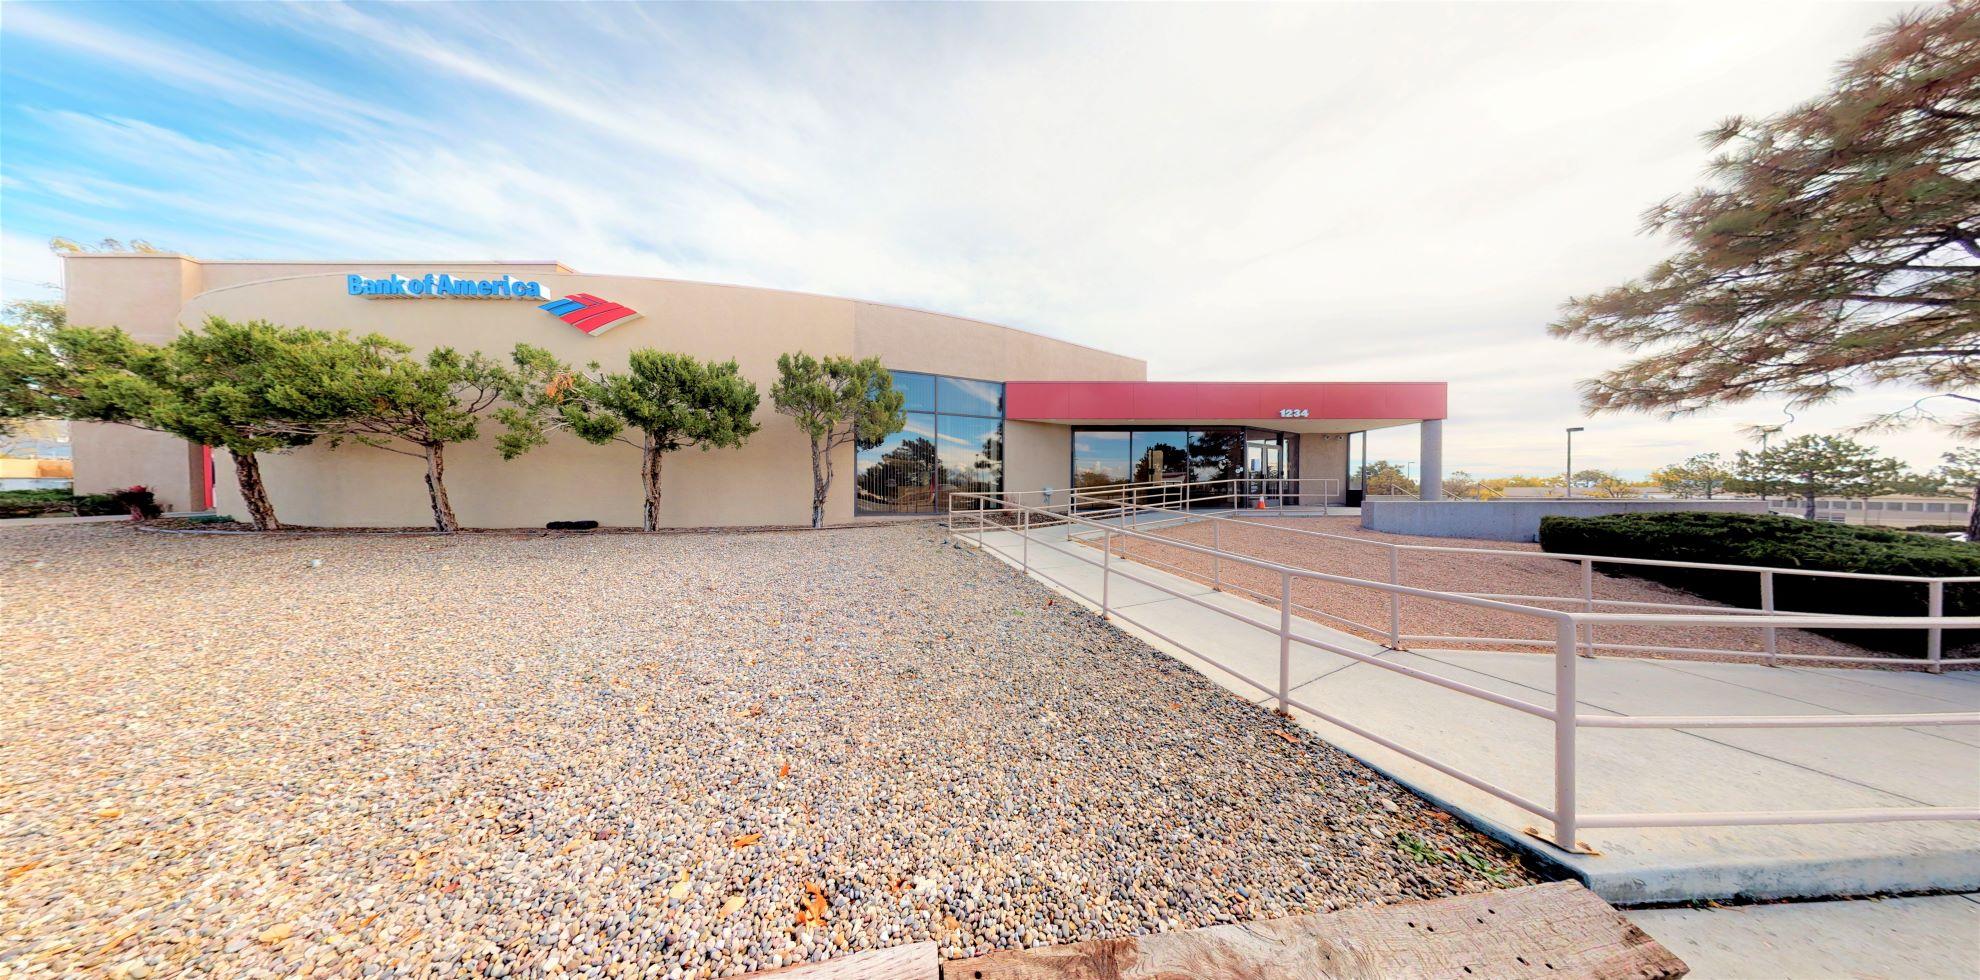 Bank of America financial center with drive-thru ATM | 1234 Saint Michaels Dr, Santa Fe, NM 87505